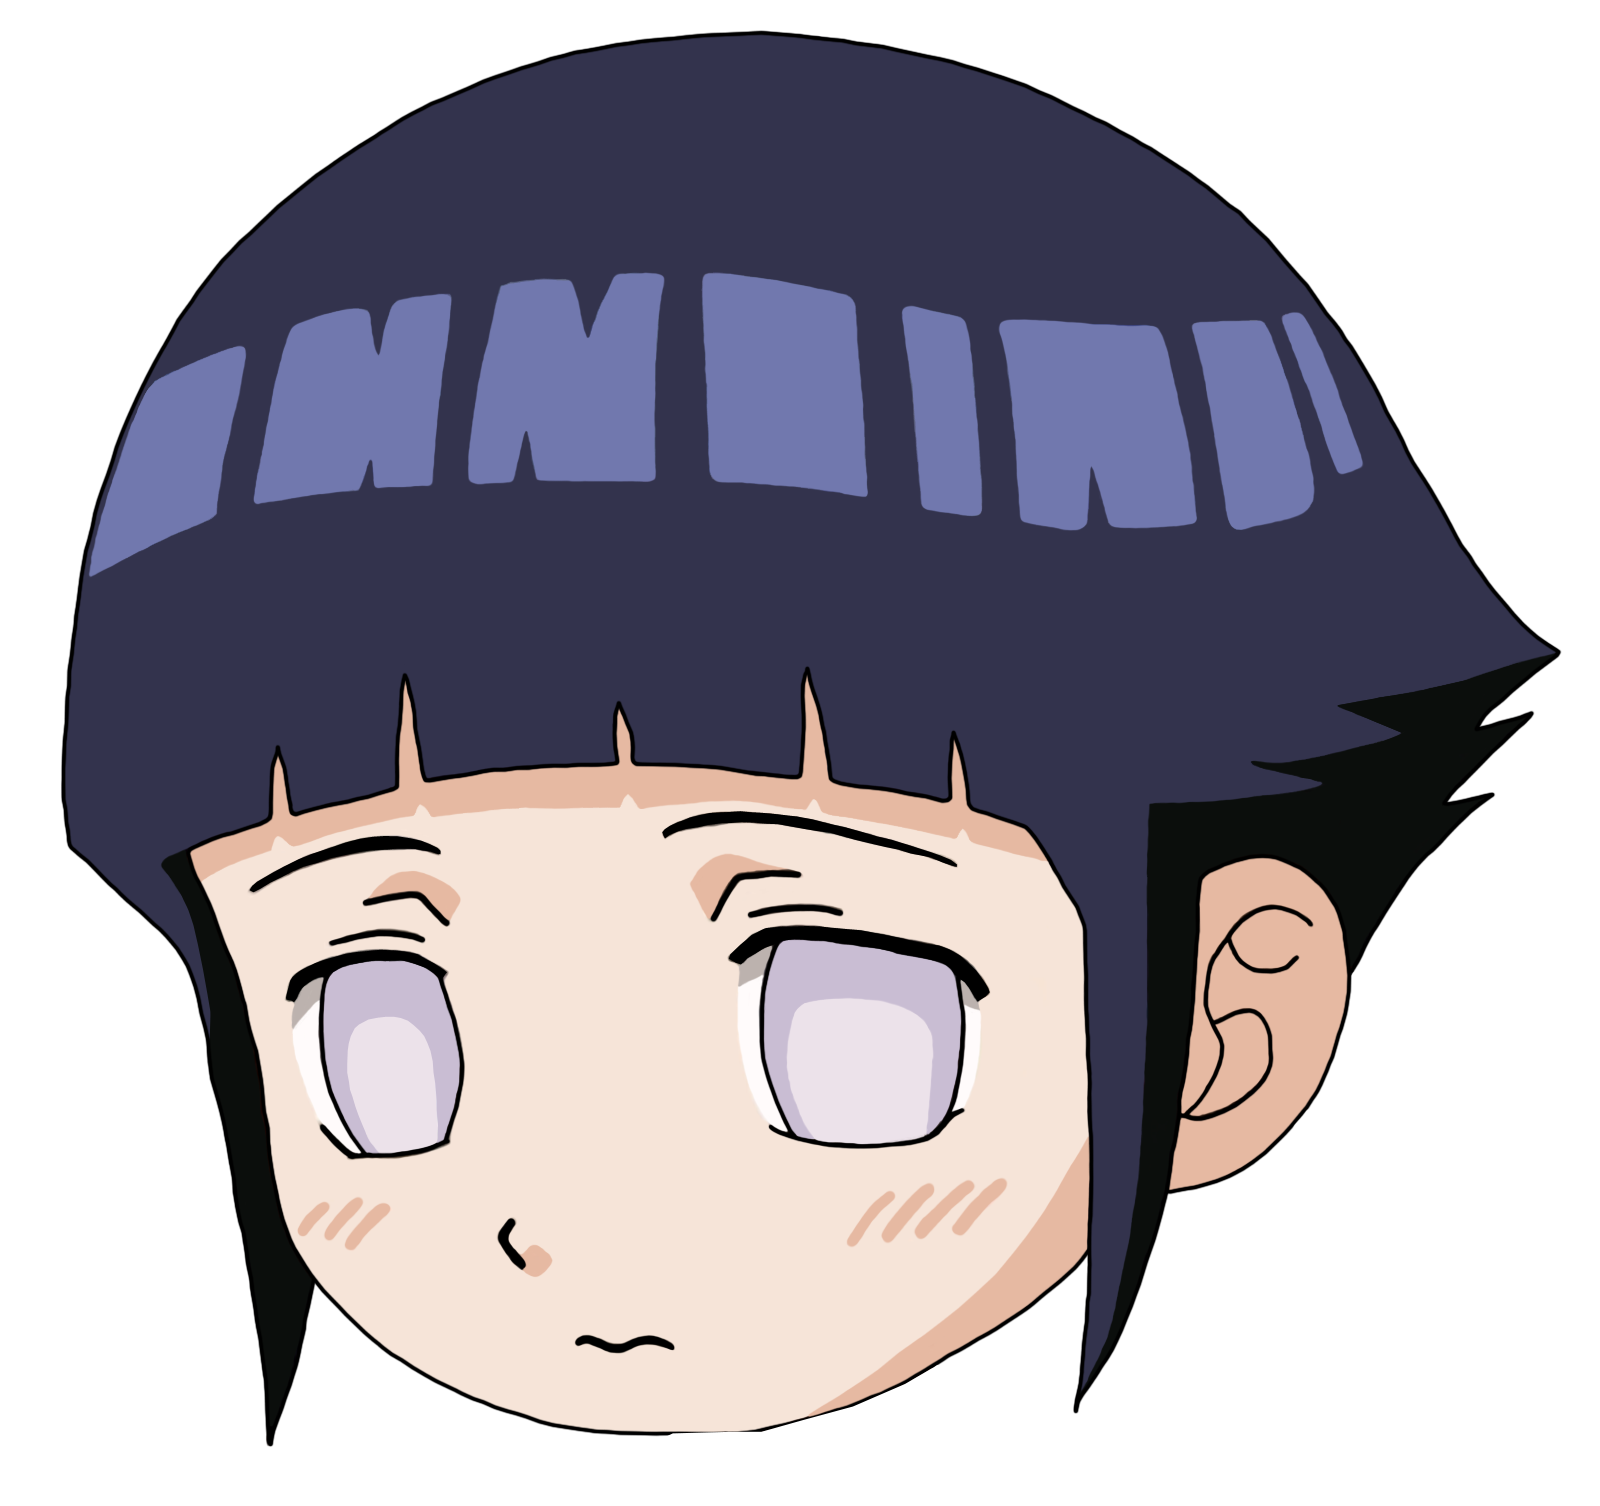 Gambar Mentahan Kepala Naruto Dan Kawan Kawan GRAFIS